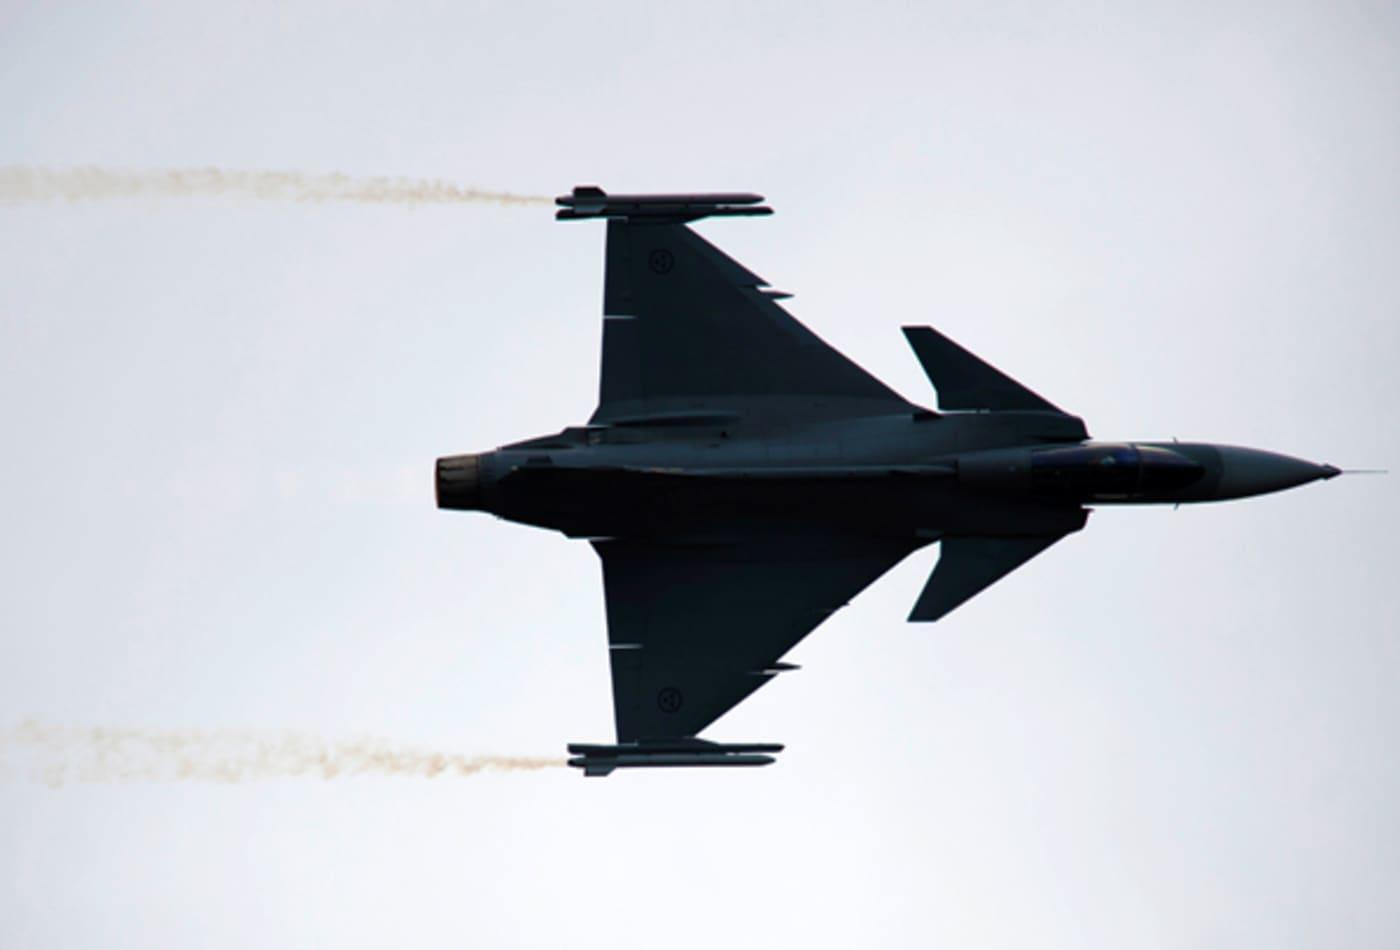 SAAB_Gripen_Fighter_Farnborough.jpg